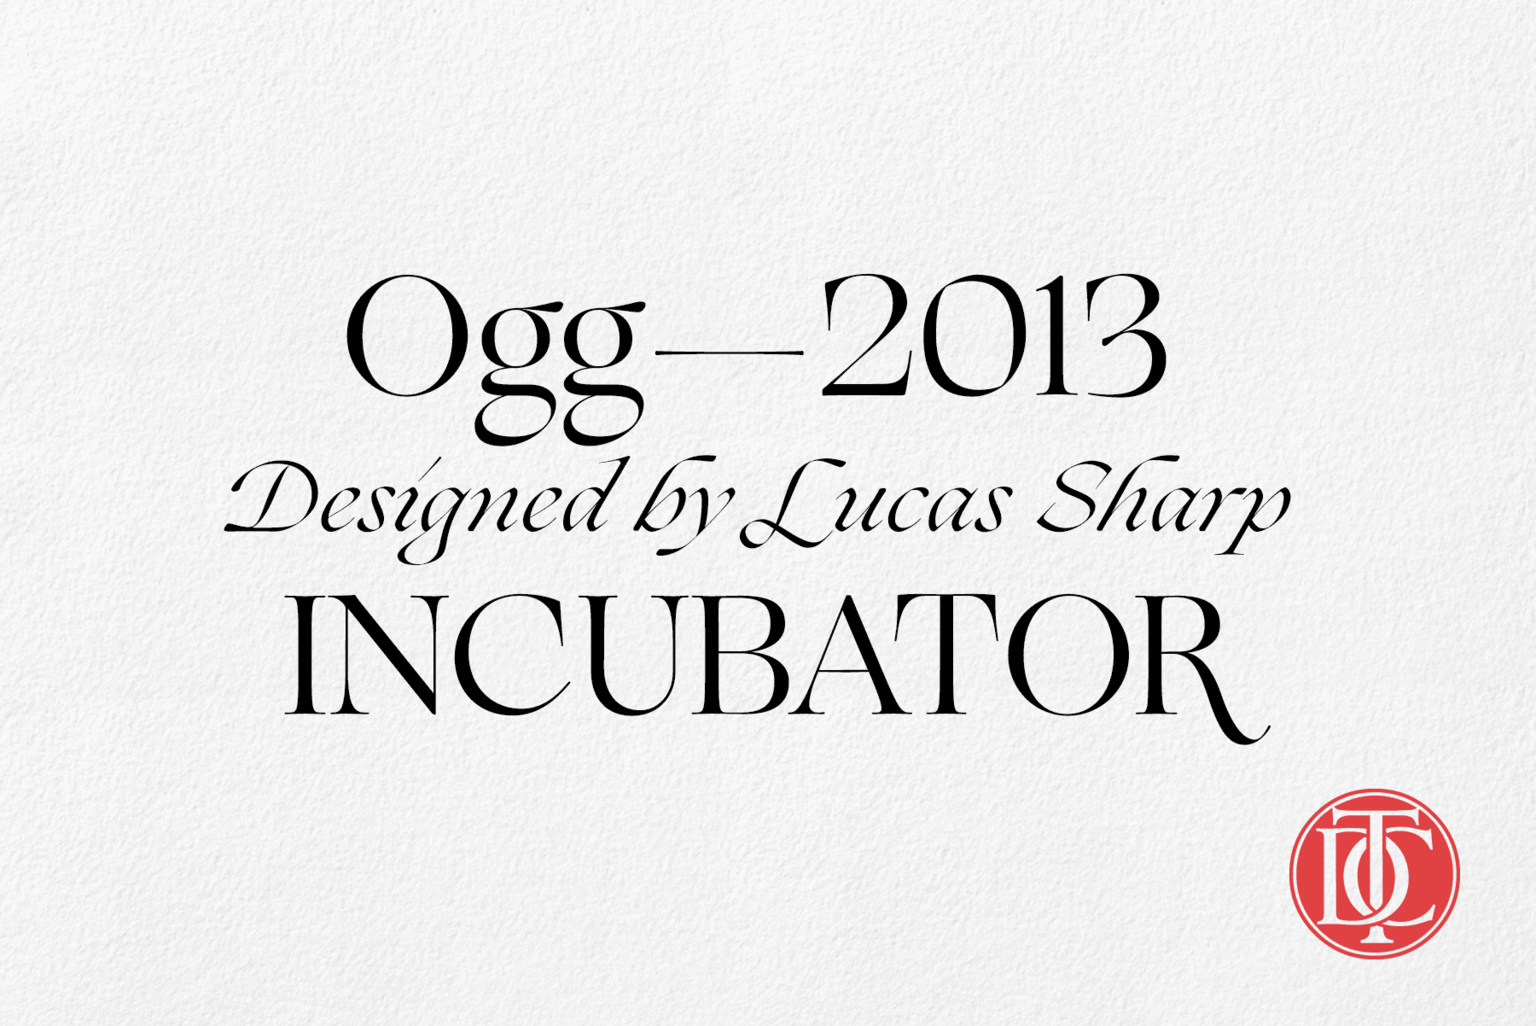 Vllg incubator ogg tdc